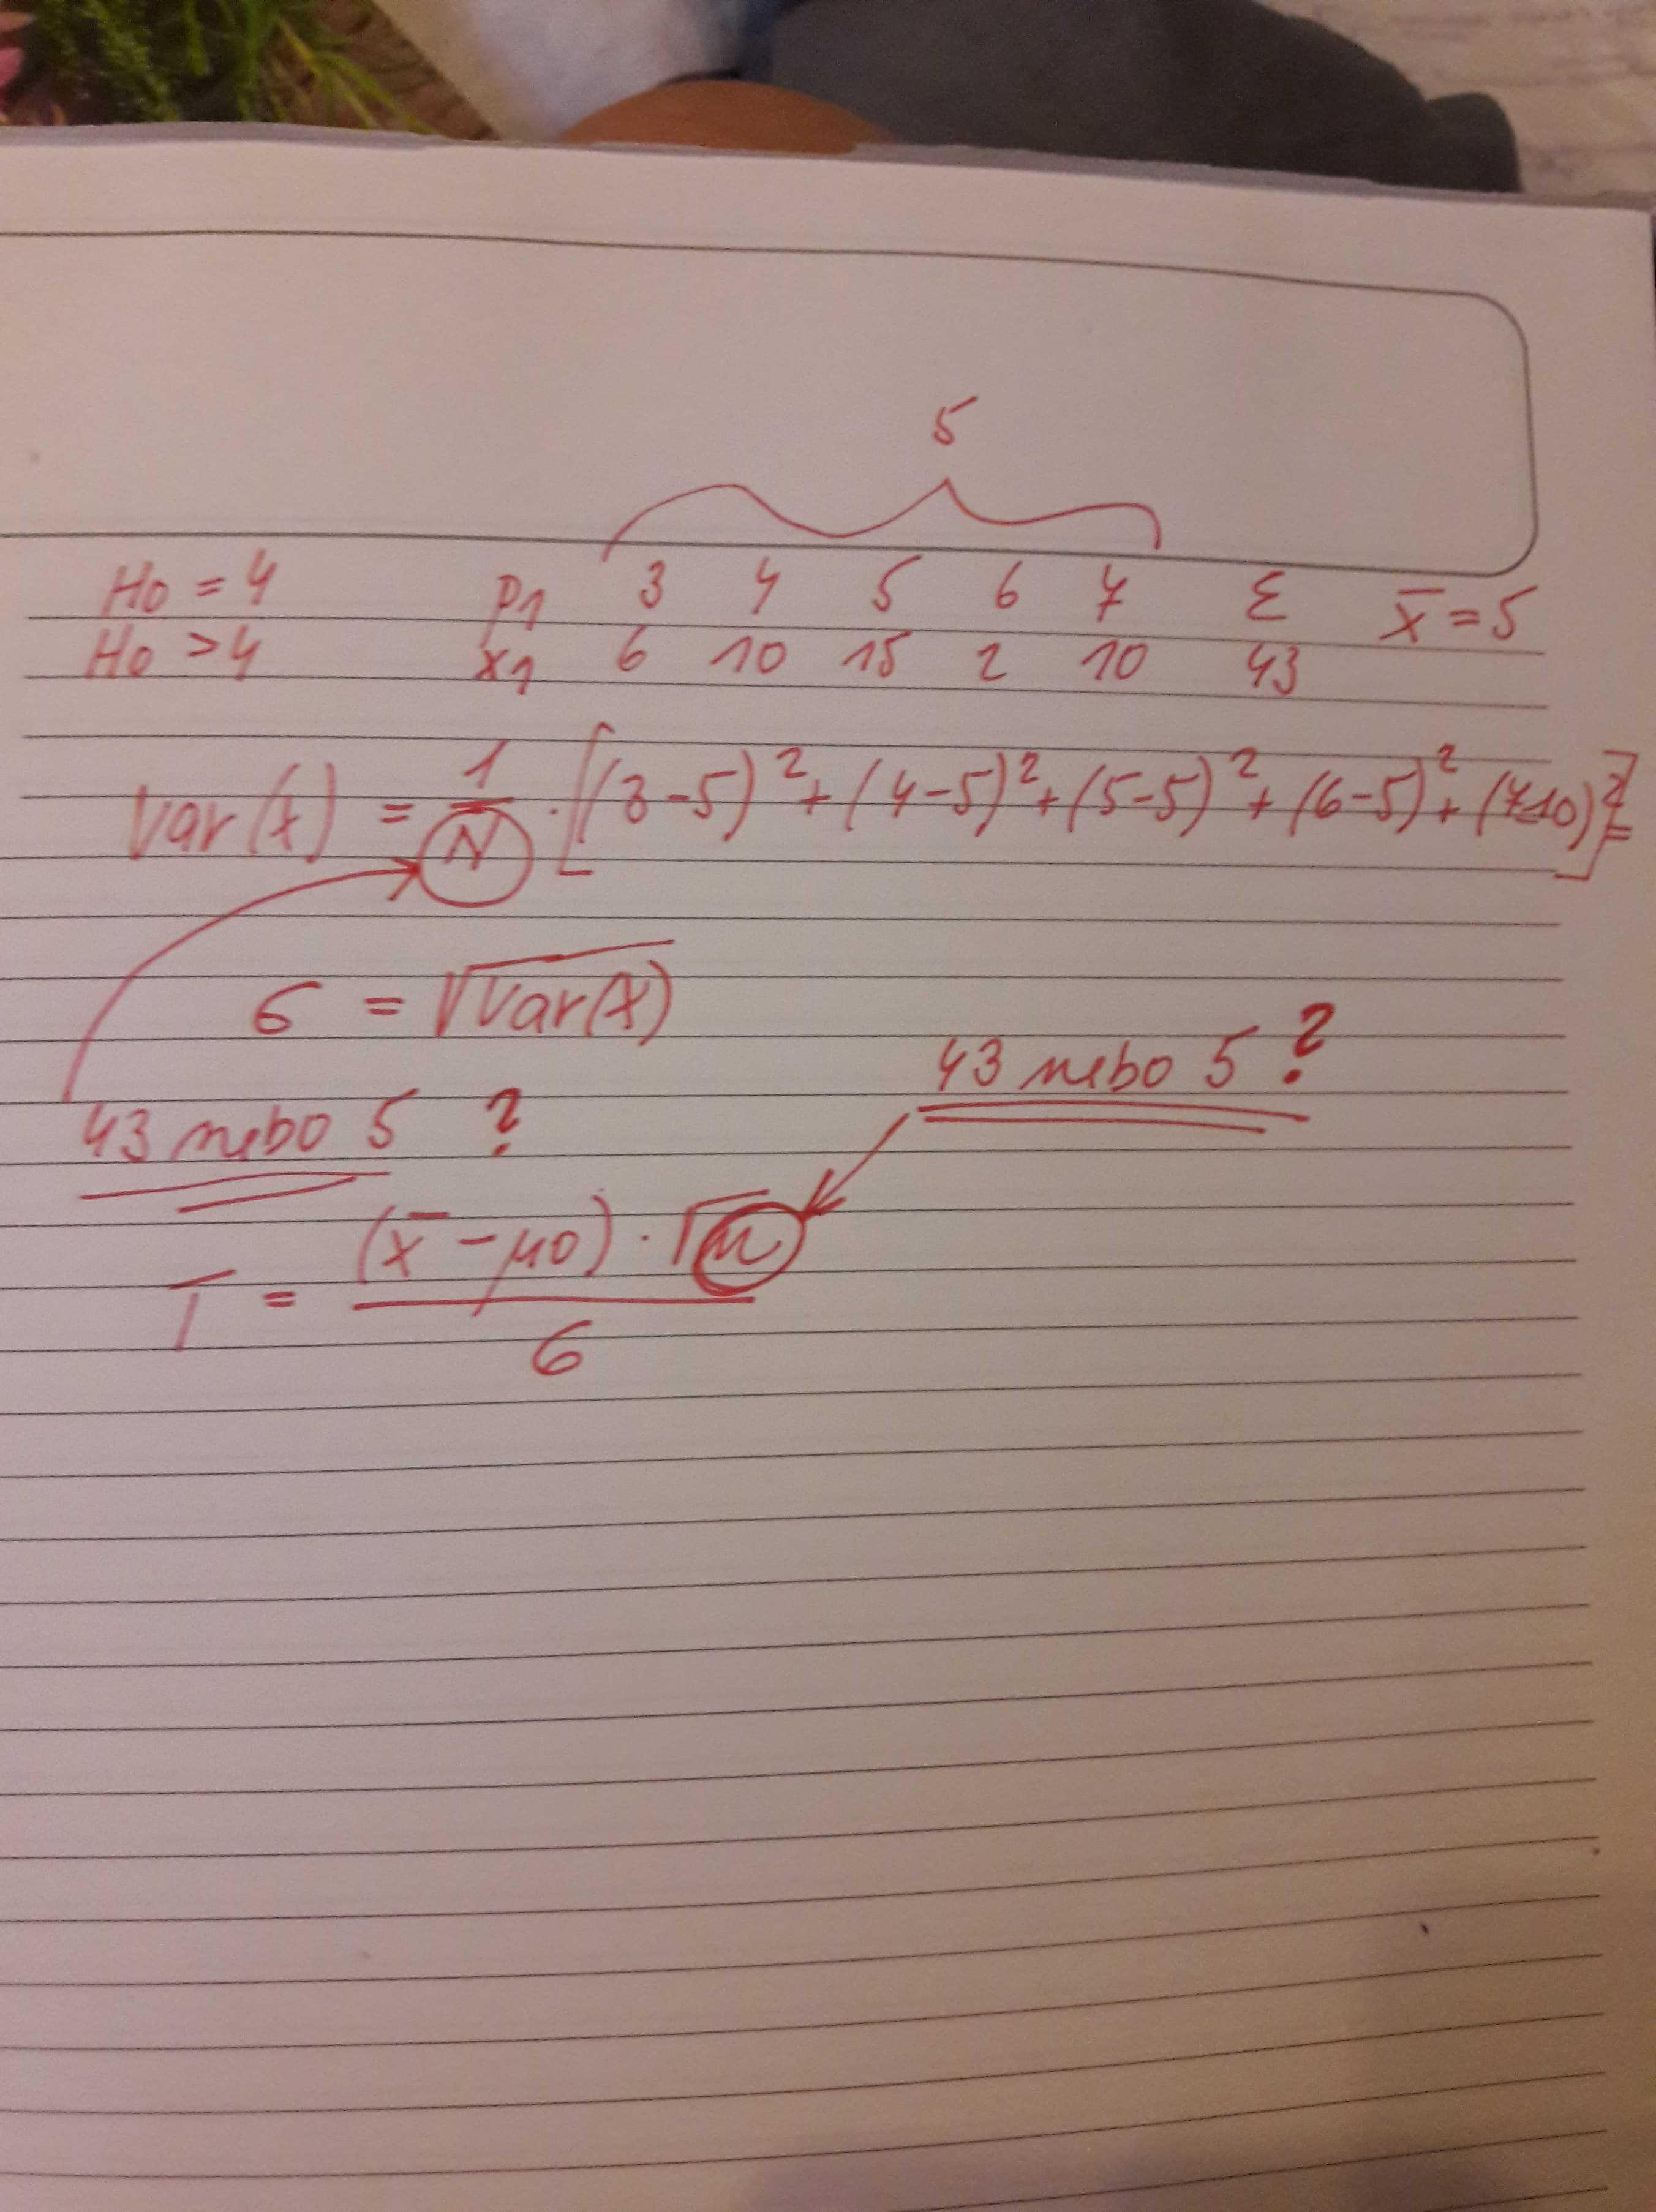 http://forum.matematika.cz/upload3/img/2018-06/69701_34748221_10209652729194691_7254570130858835968_n.jpg